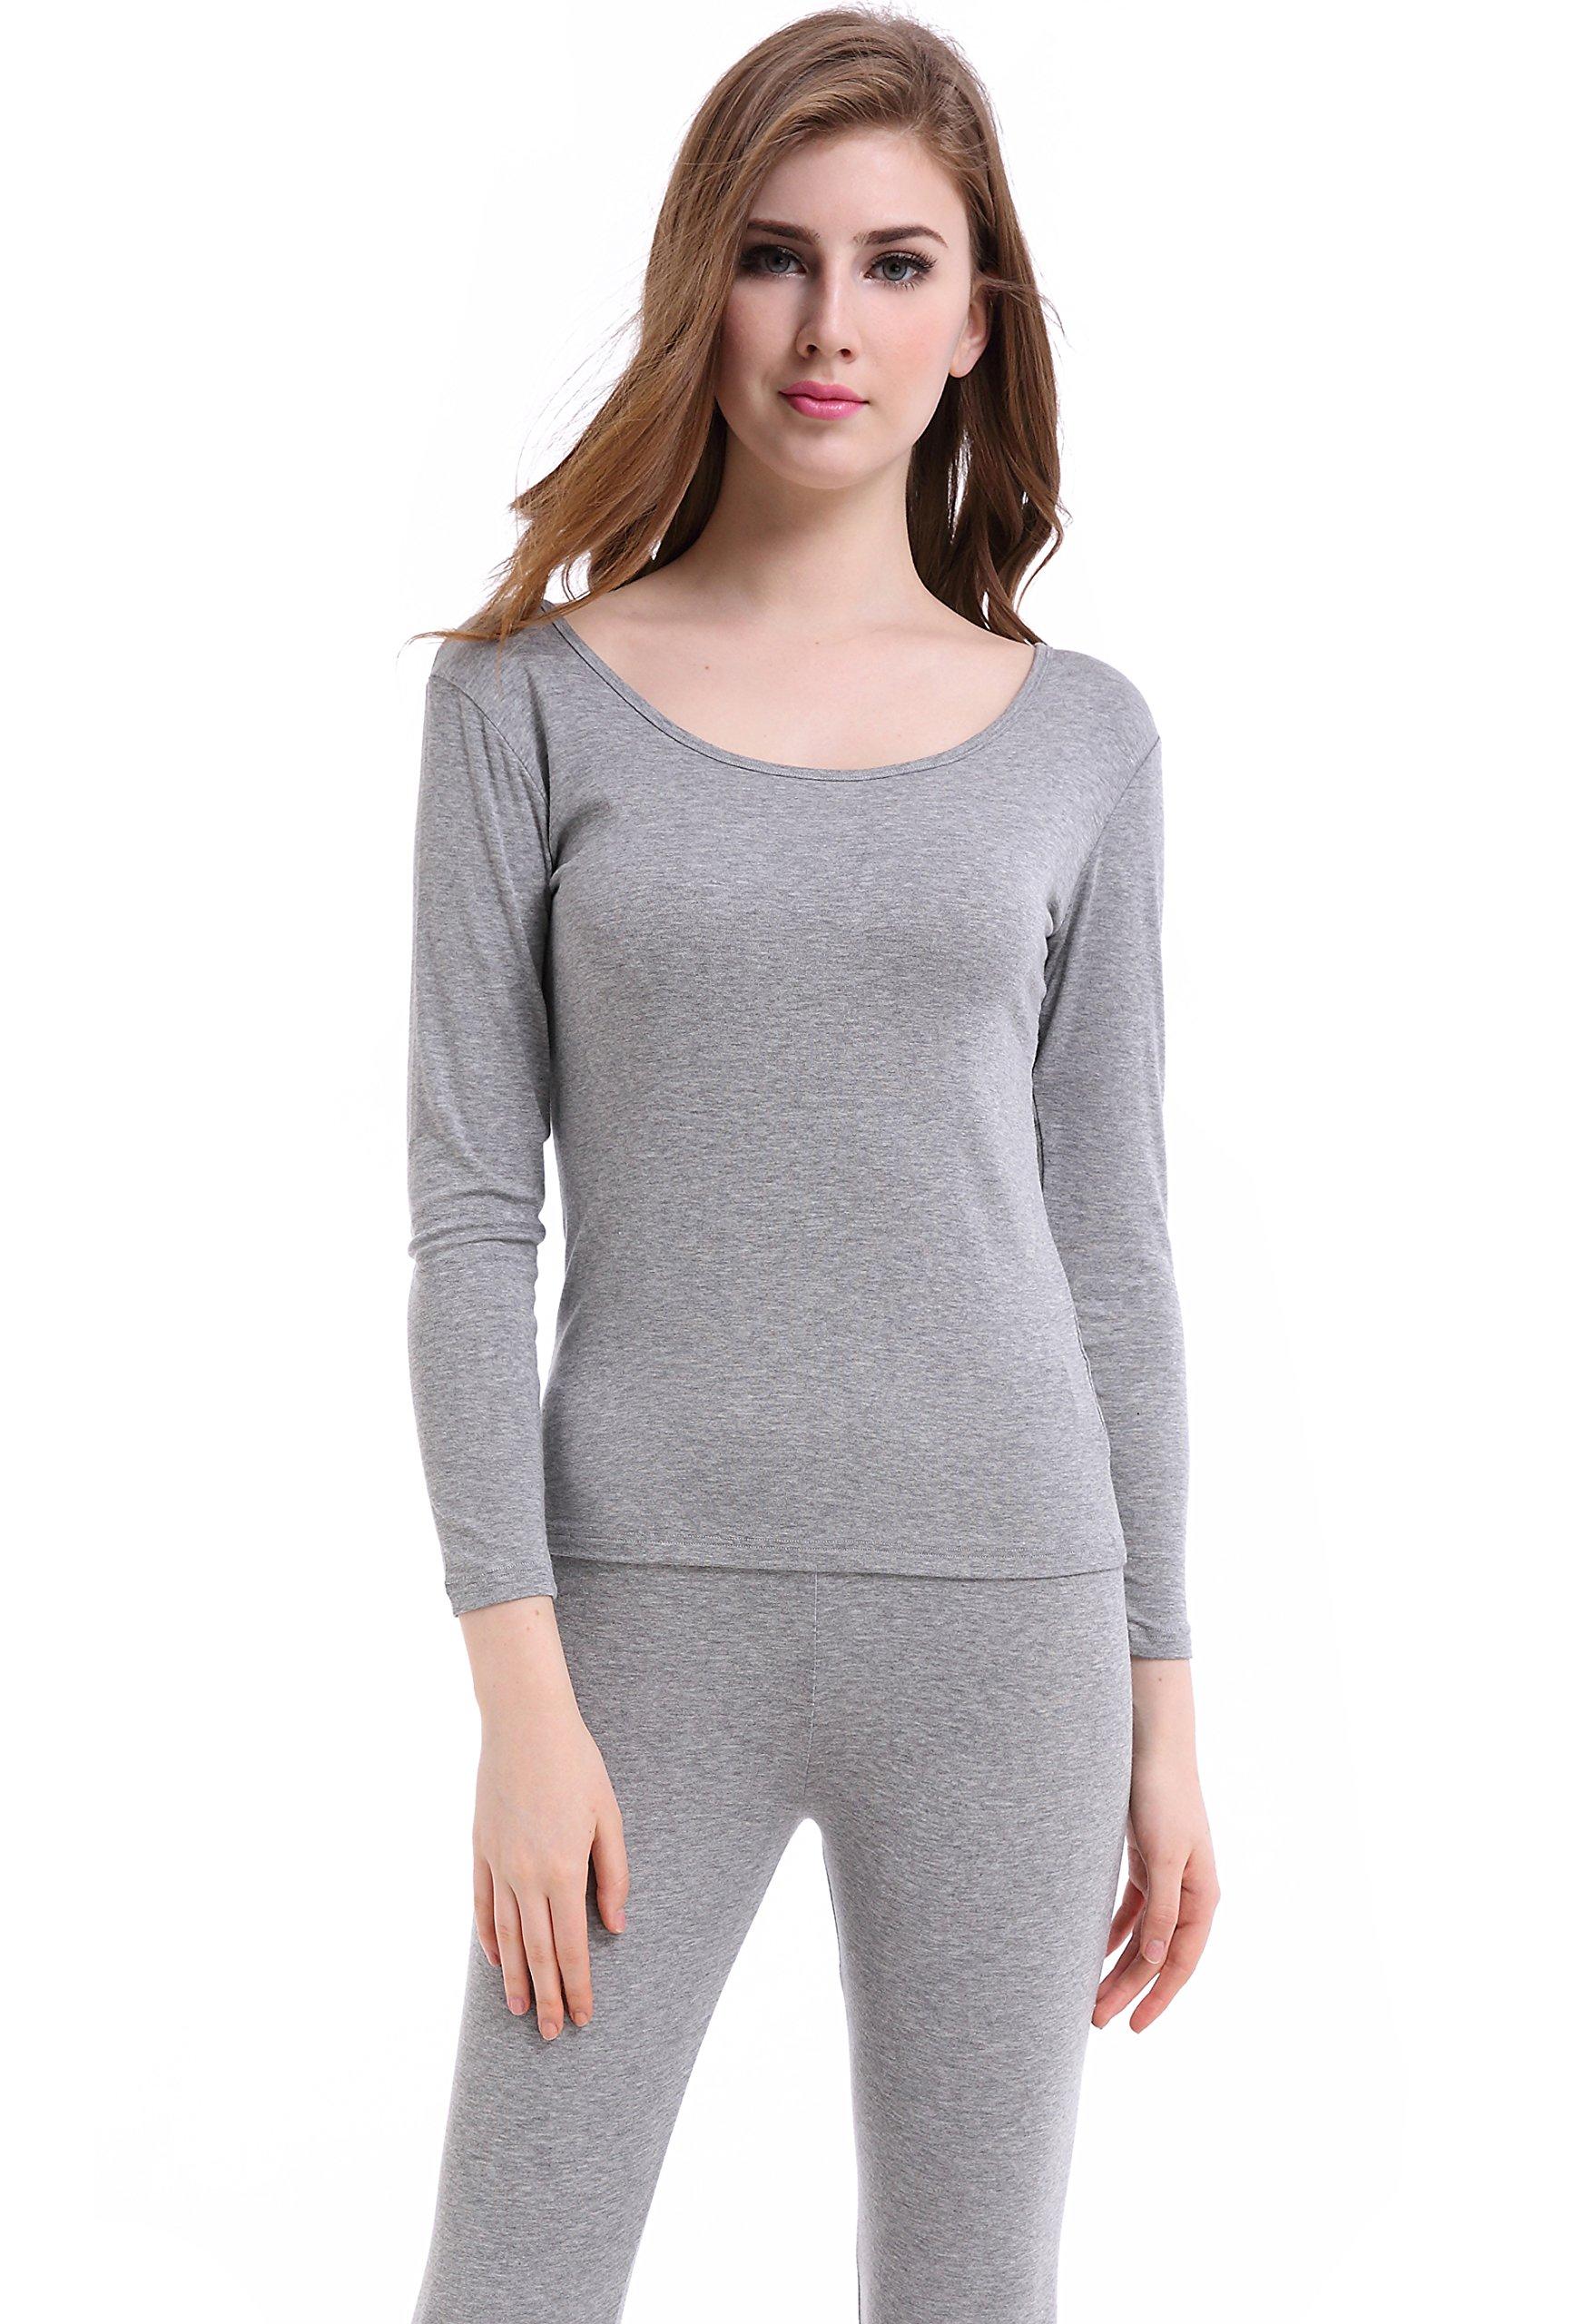 Thermal Underwear Women Long Base Layer Winter -Ultra Thin Set Bottom Pajama